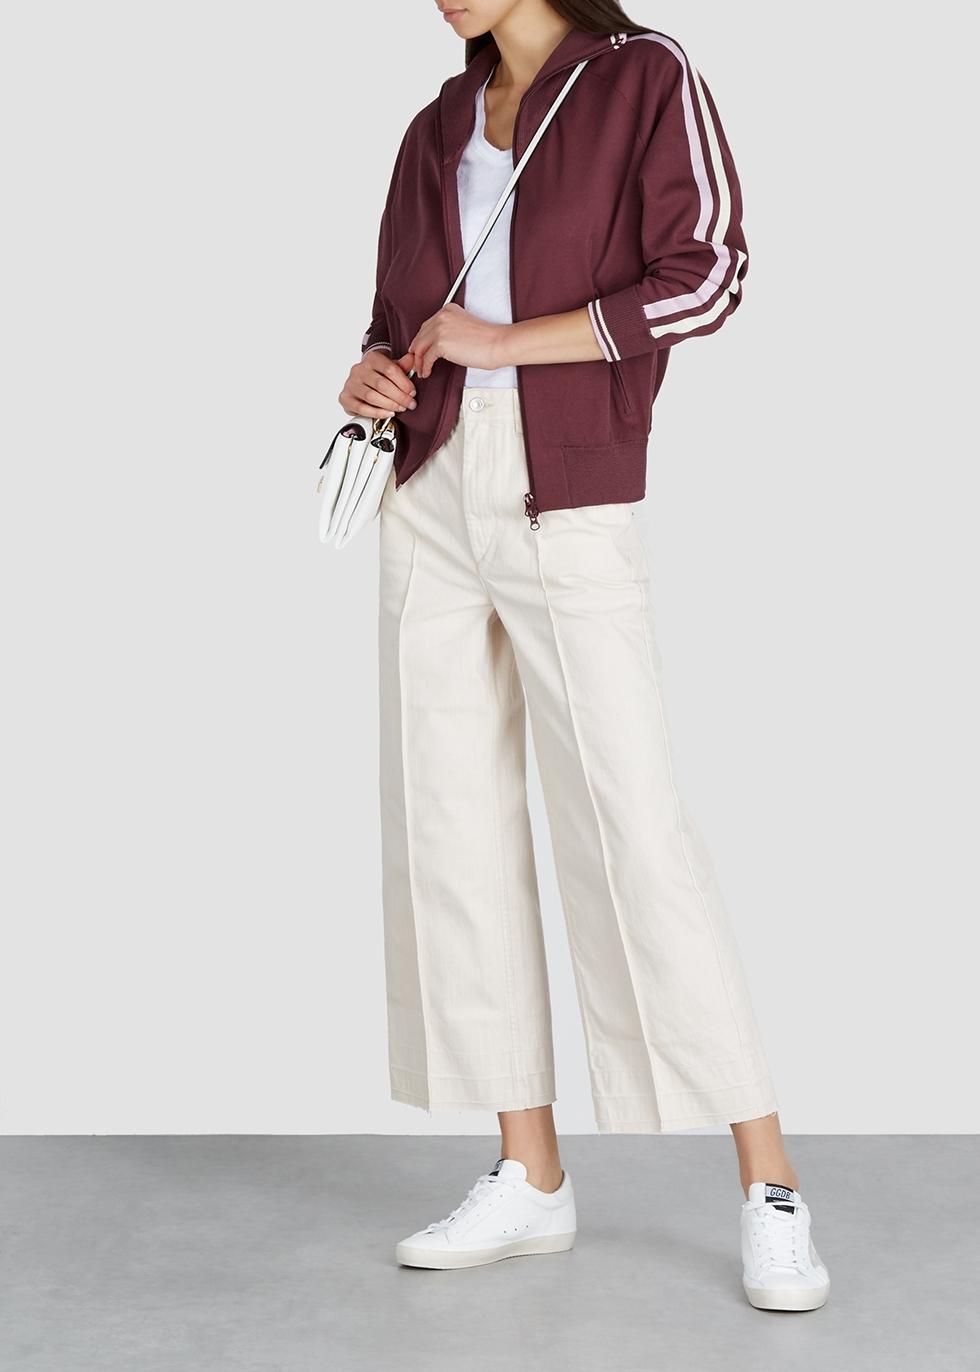 Darcey striped knitted sweatshirt - Isabel Marant Étoile